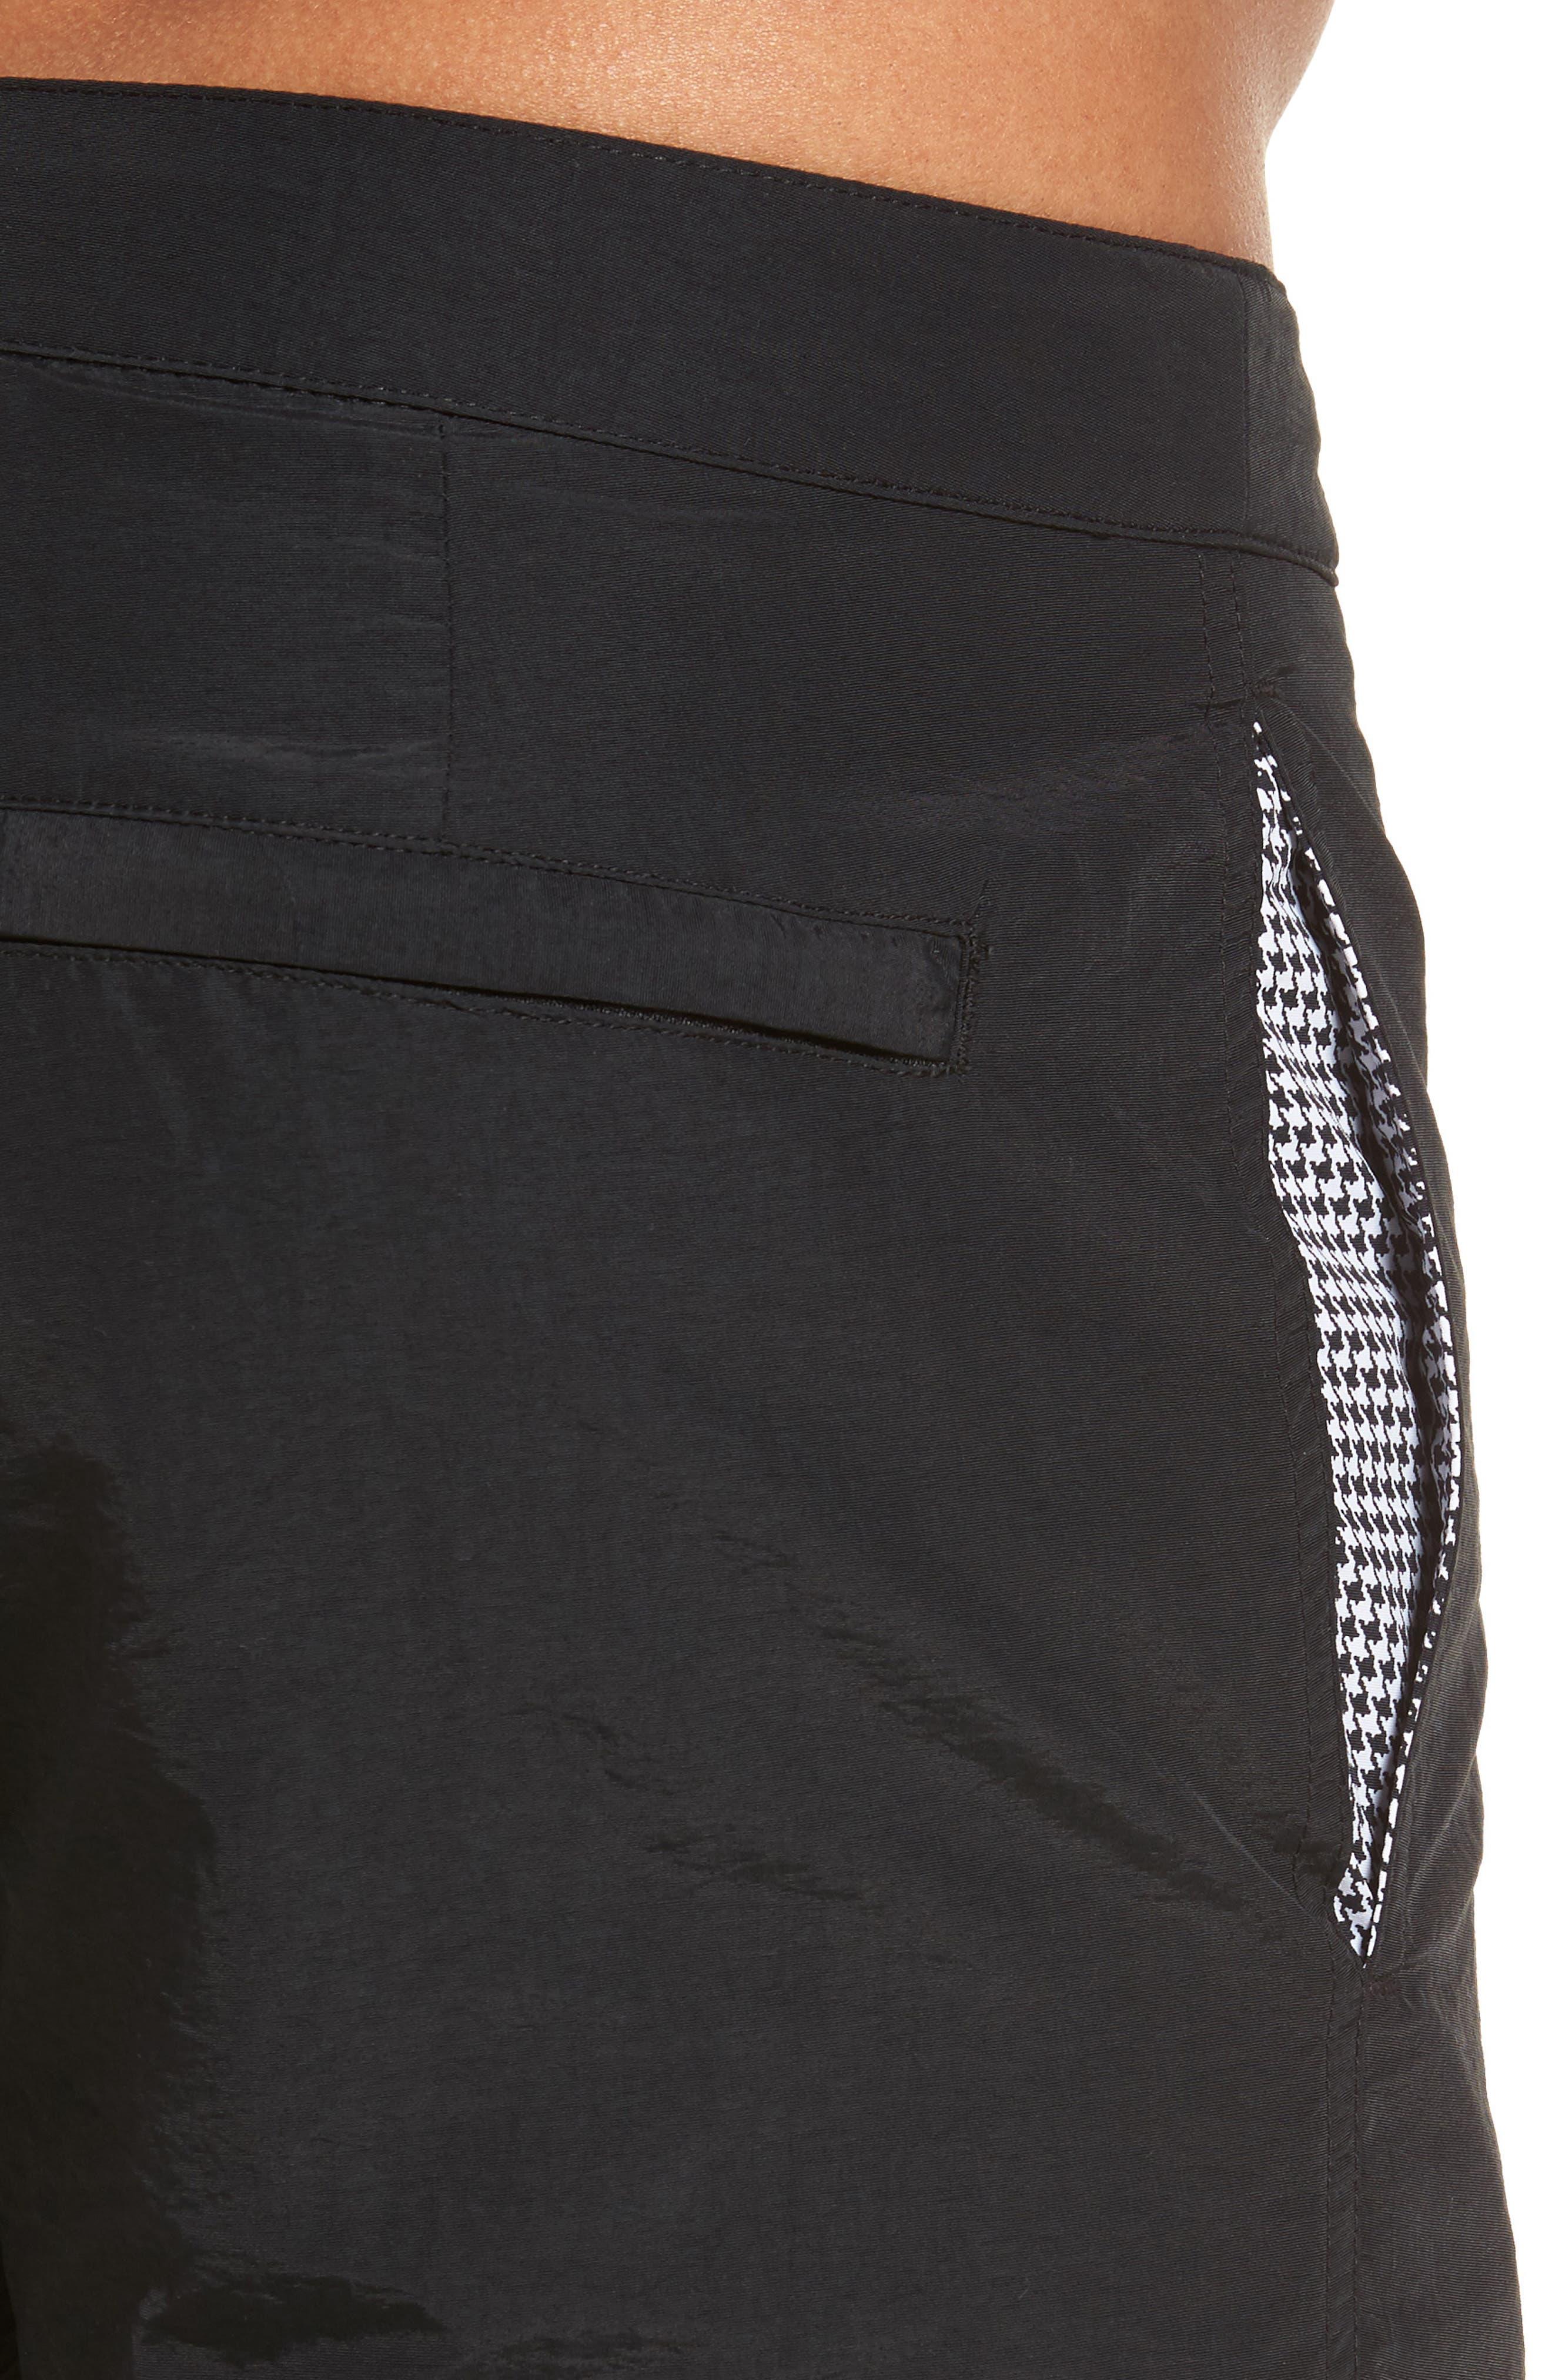 'Aruba' Tailored Fit Swim Trunks,                             Alternate thumbnail 4, color,                             Midnight Black Solid